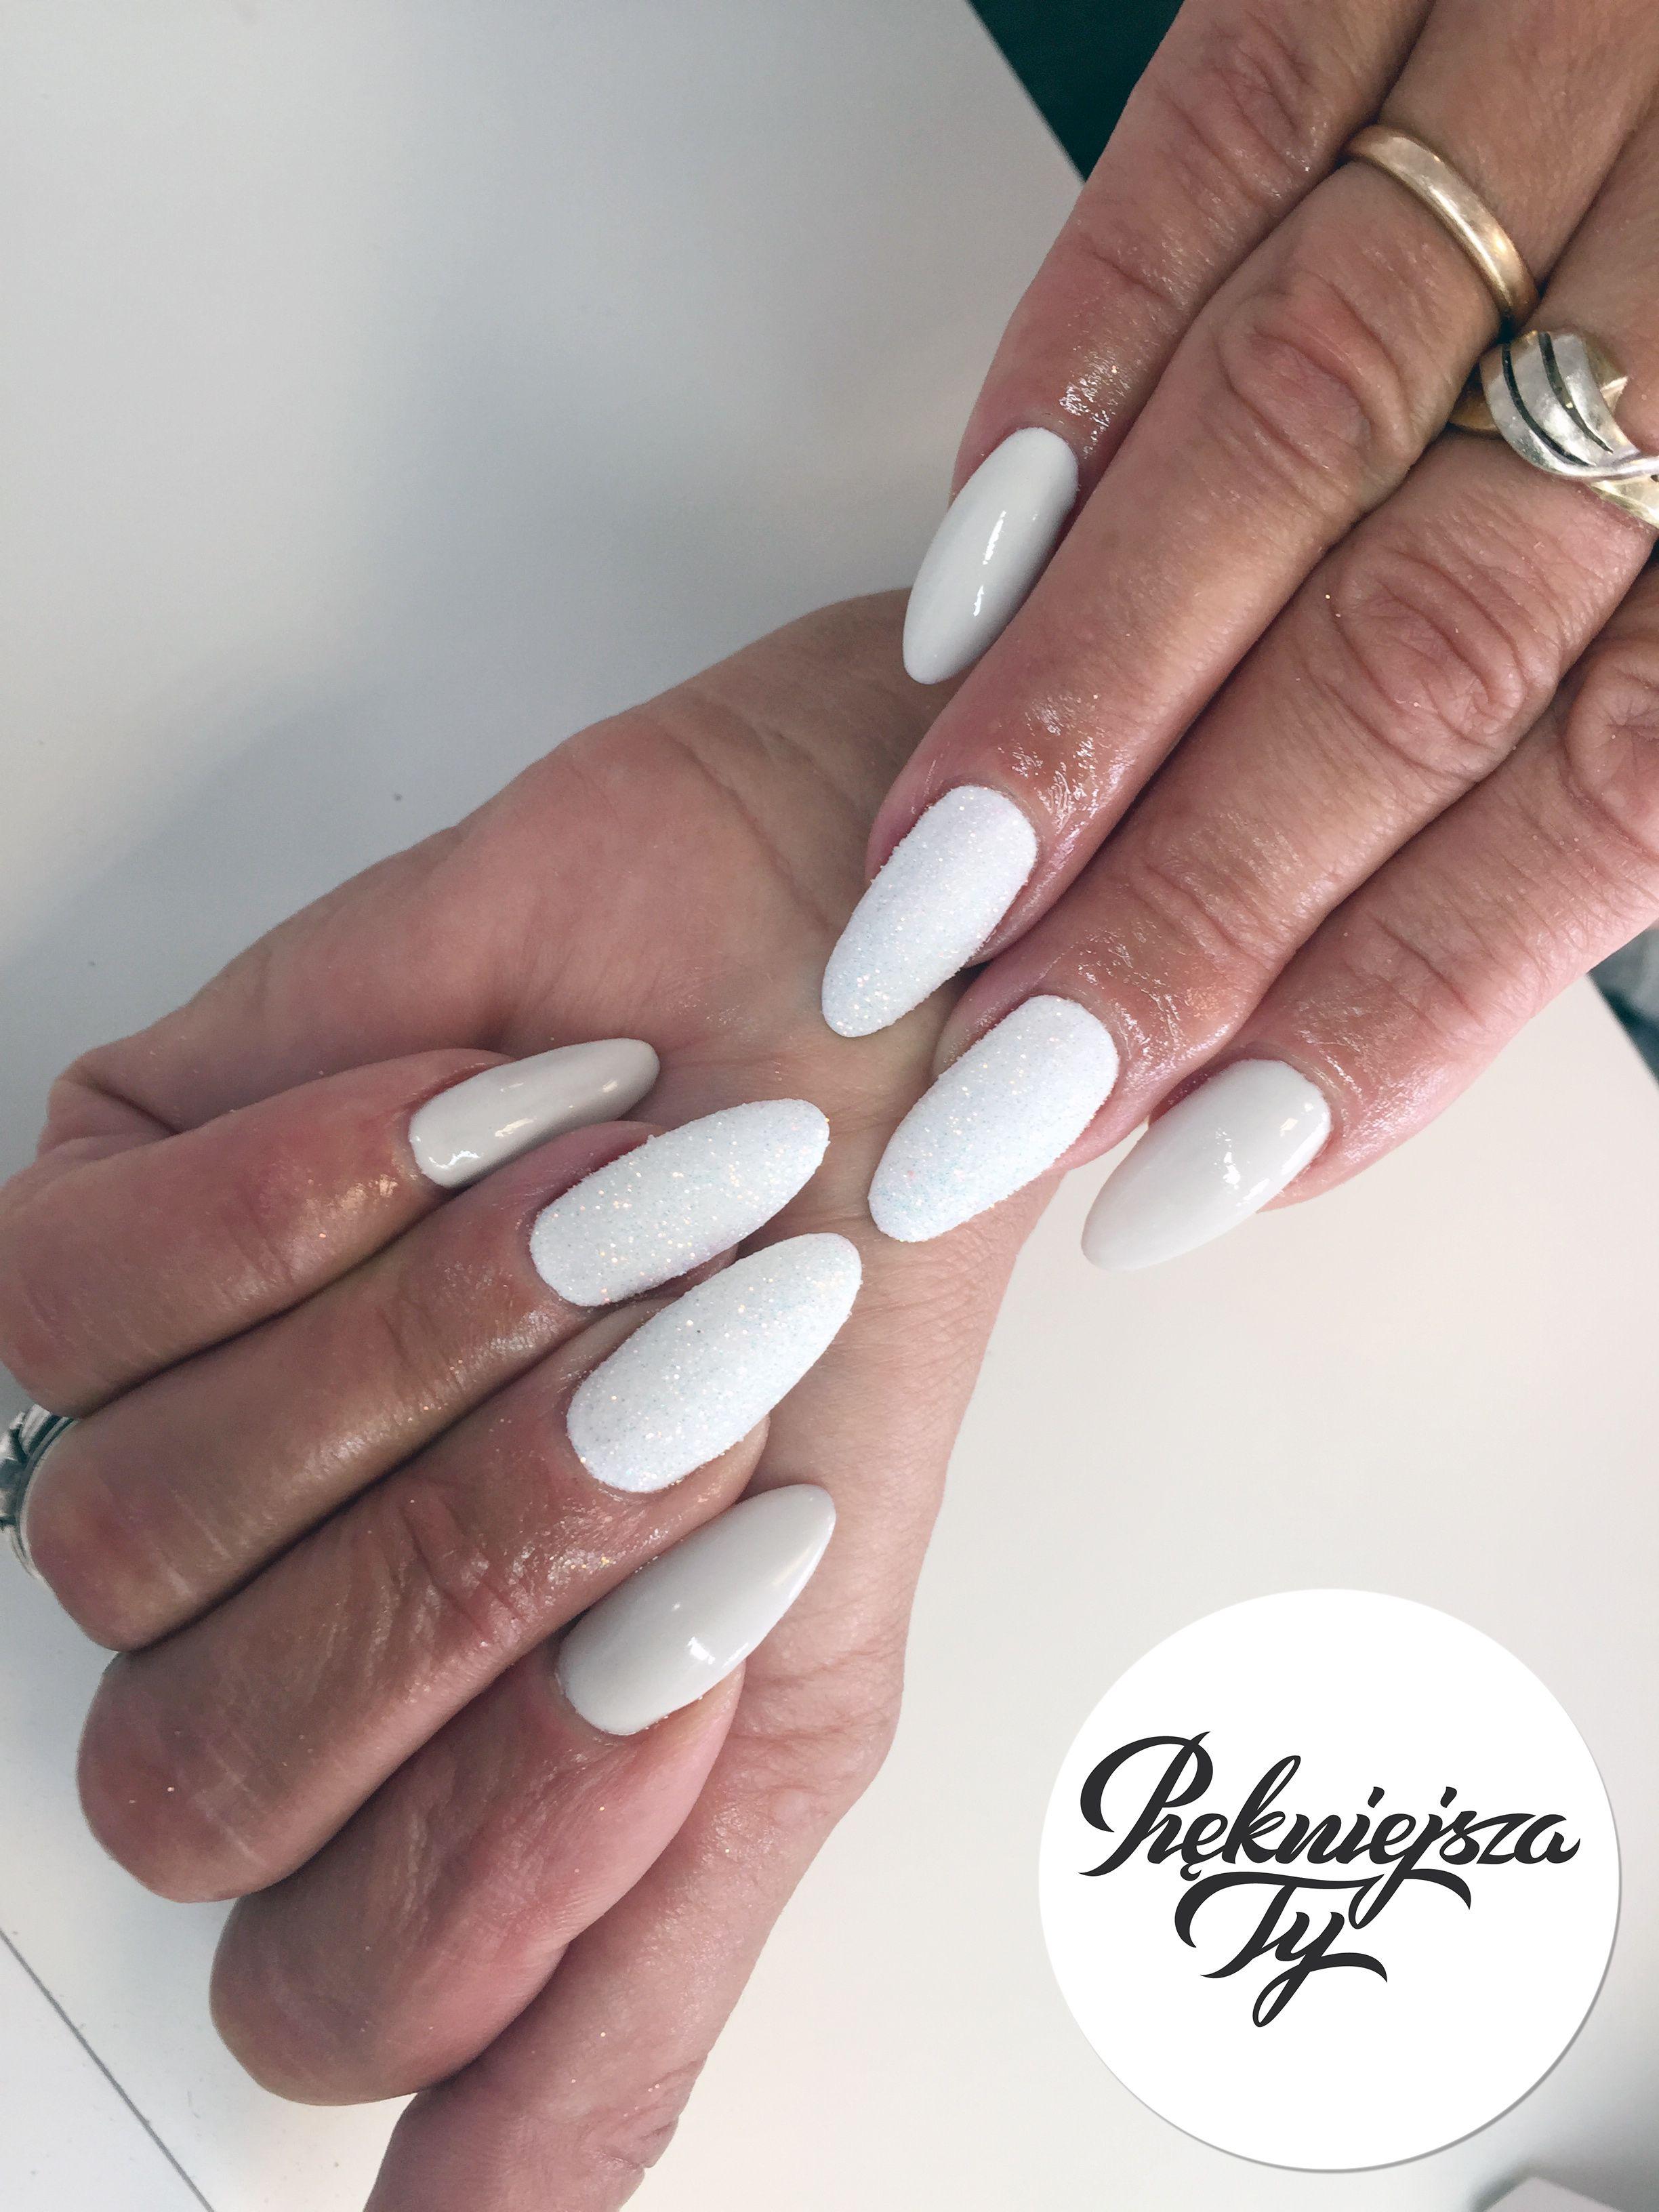 Manicure Hybrydowy With Images Manicure Sztuka Malowania Paznokci